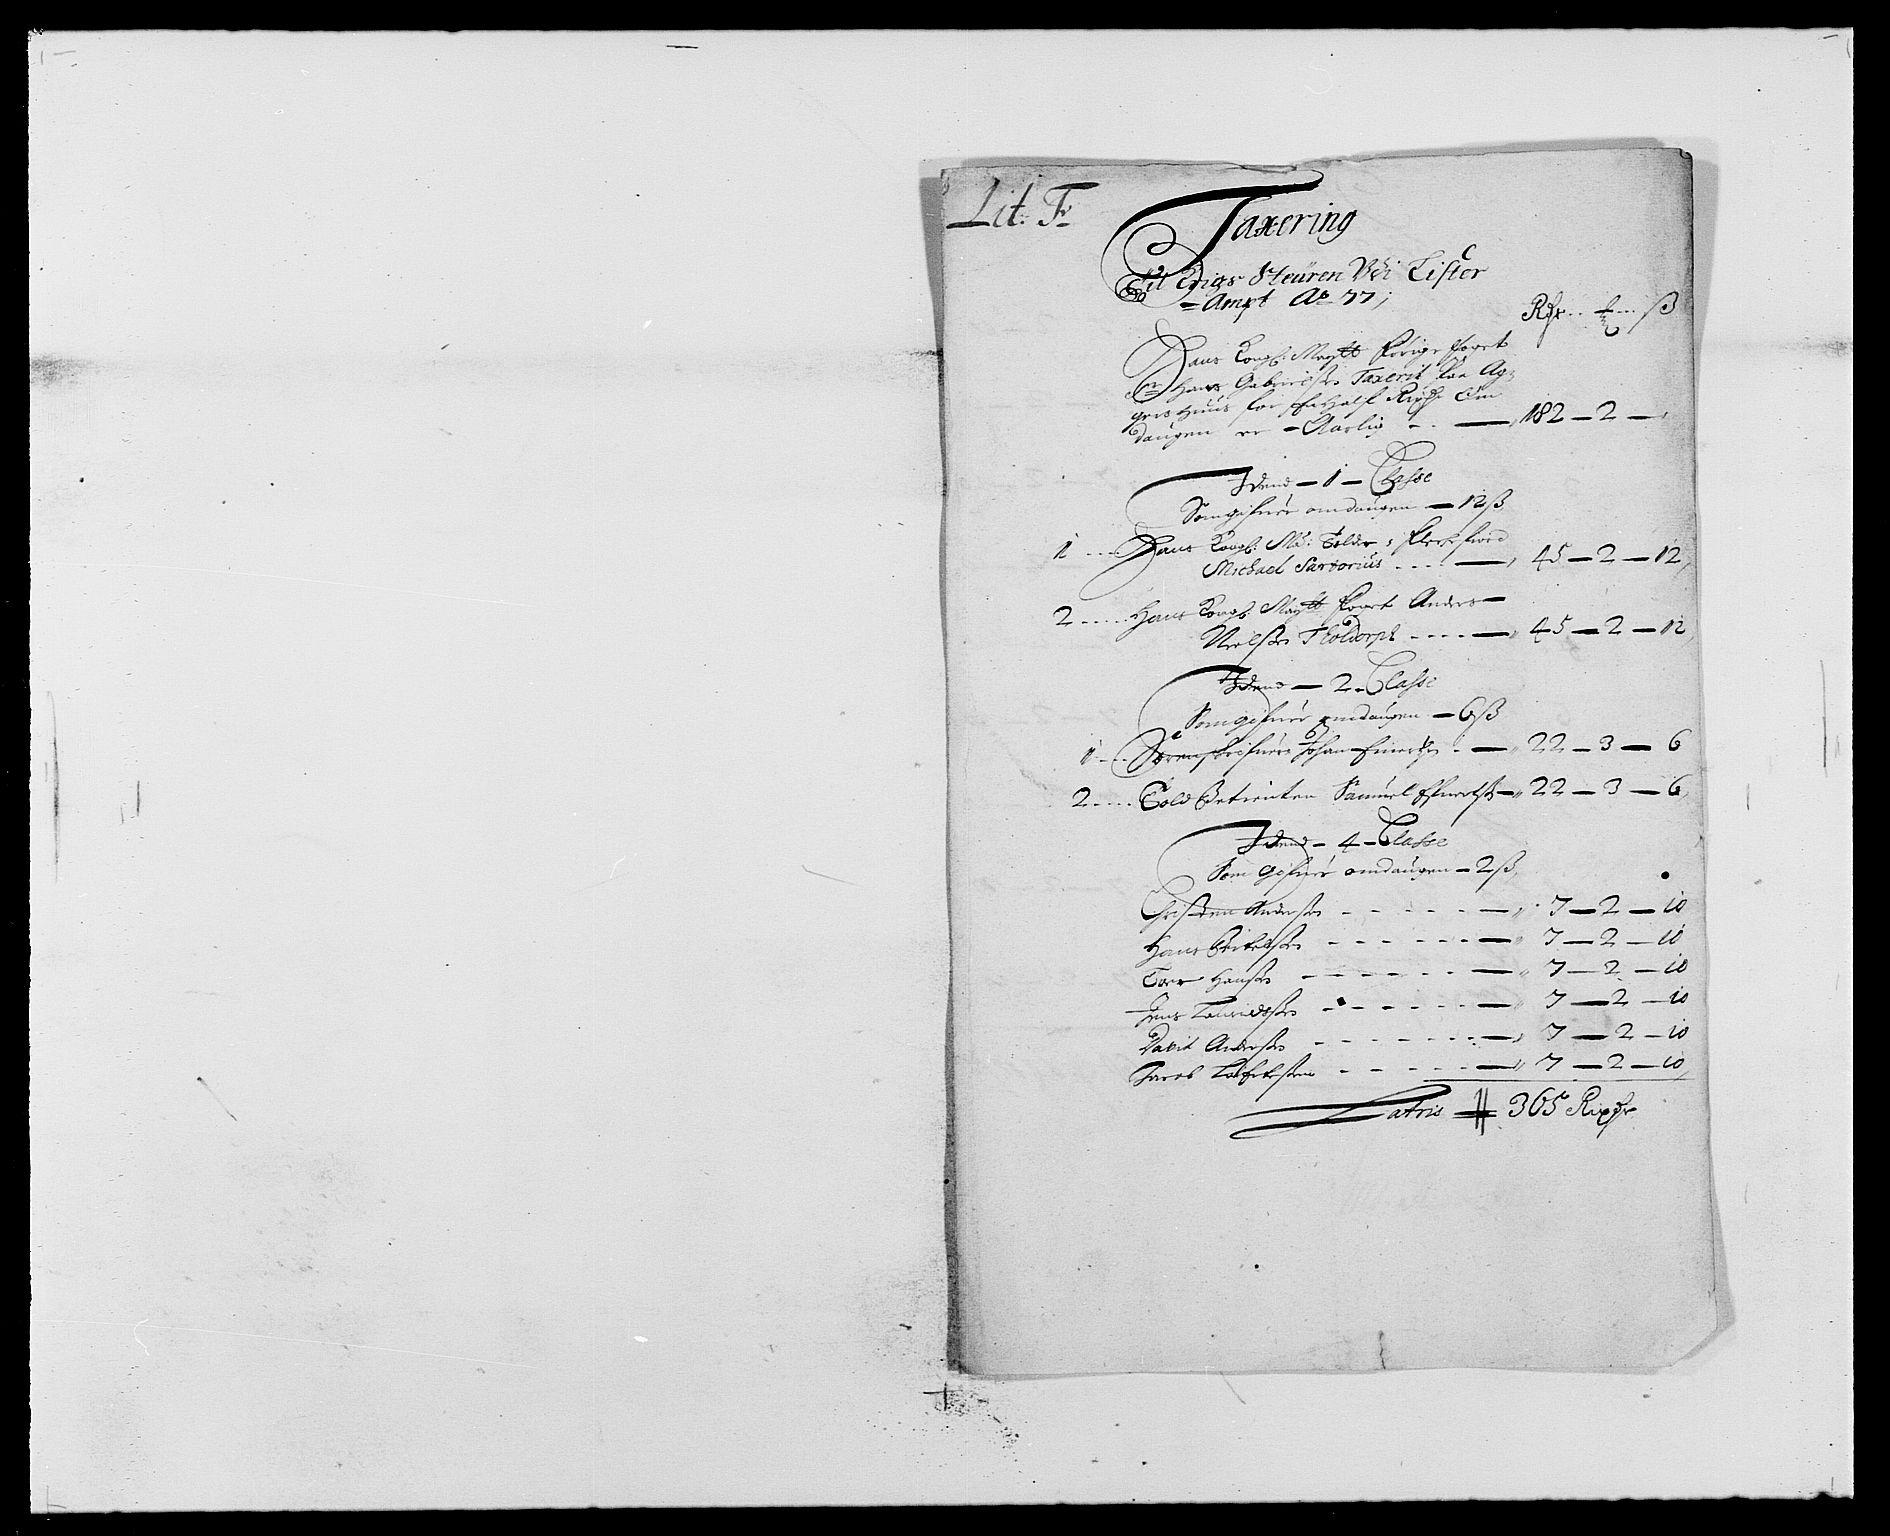 RA, Rentekammeret inntil 1814, Reviderte regnskaper, Fogderegnskap, R41/L2530: Fogderegnskap Lista, 1677-1679, s. 128